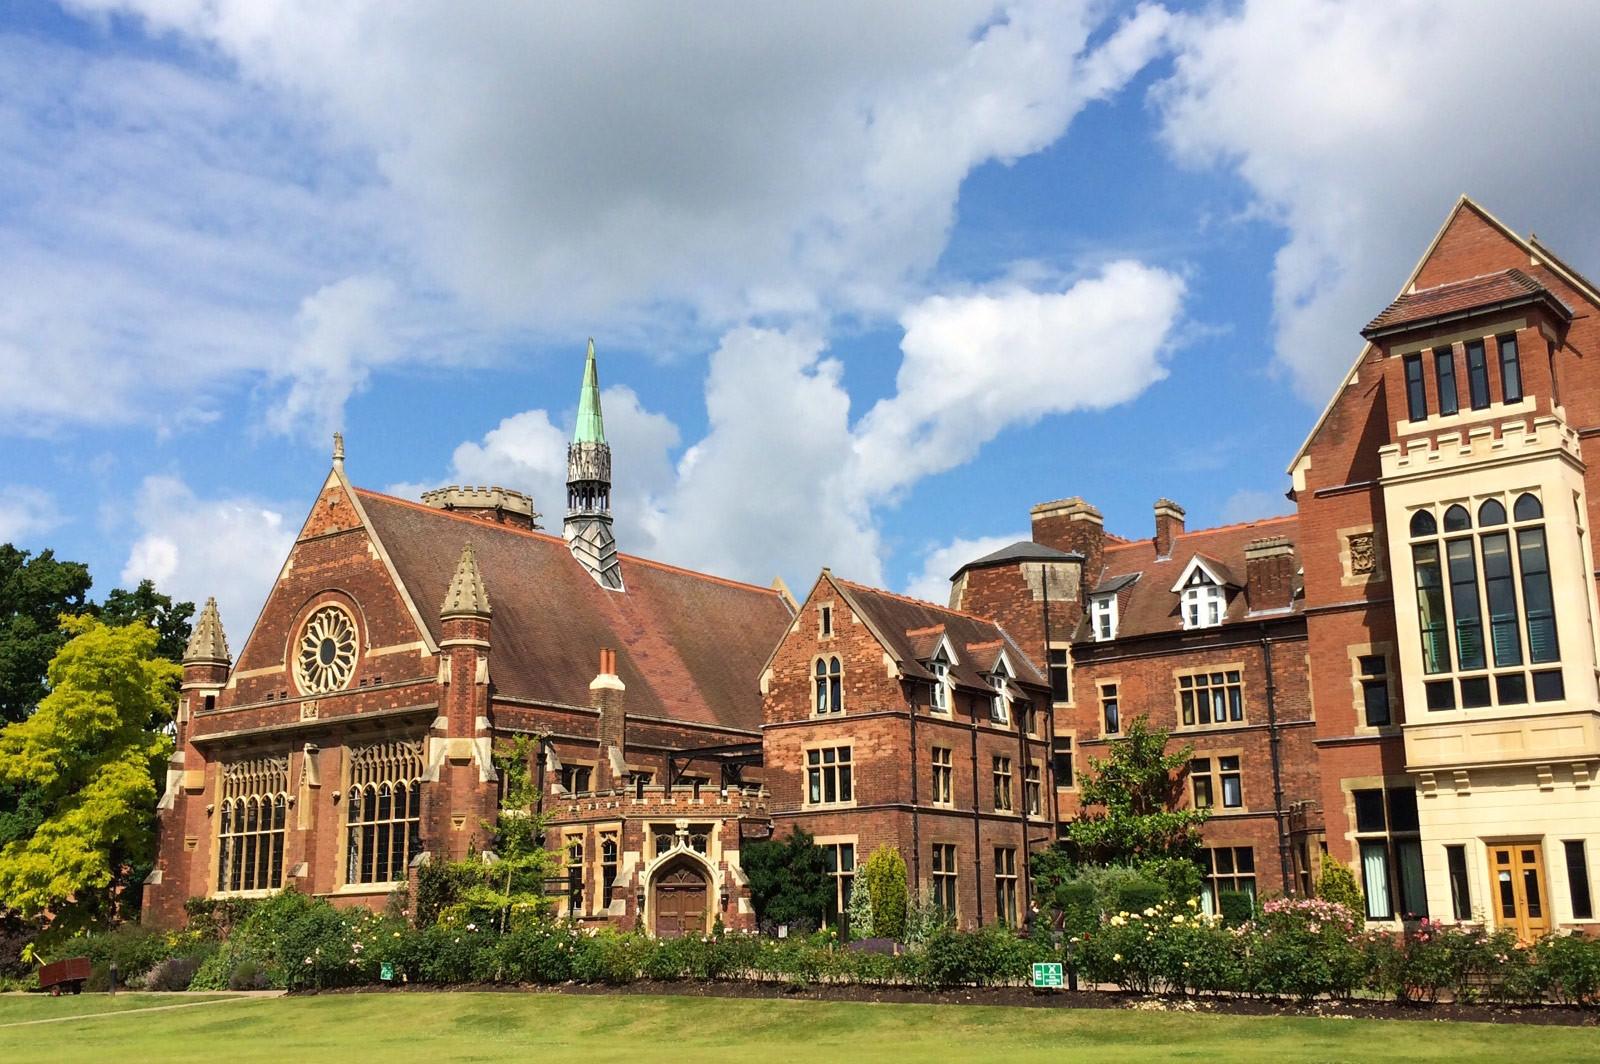 Bell Кембридж, летняя школа